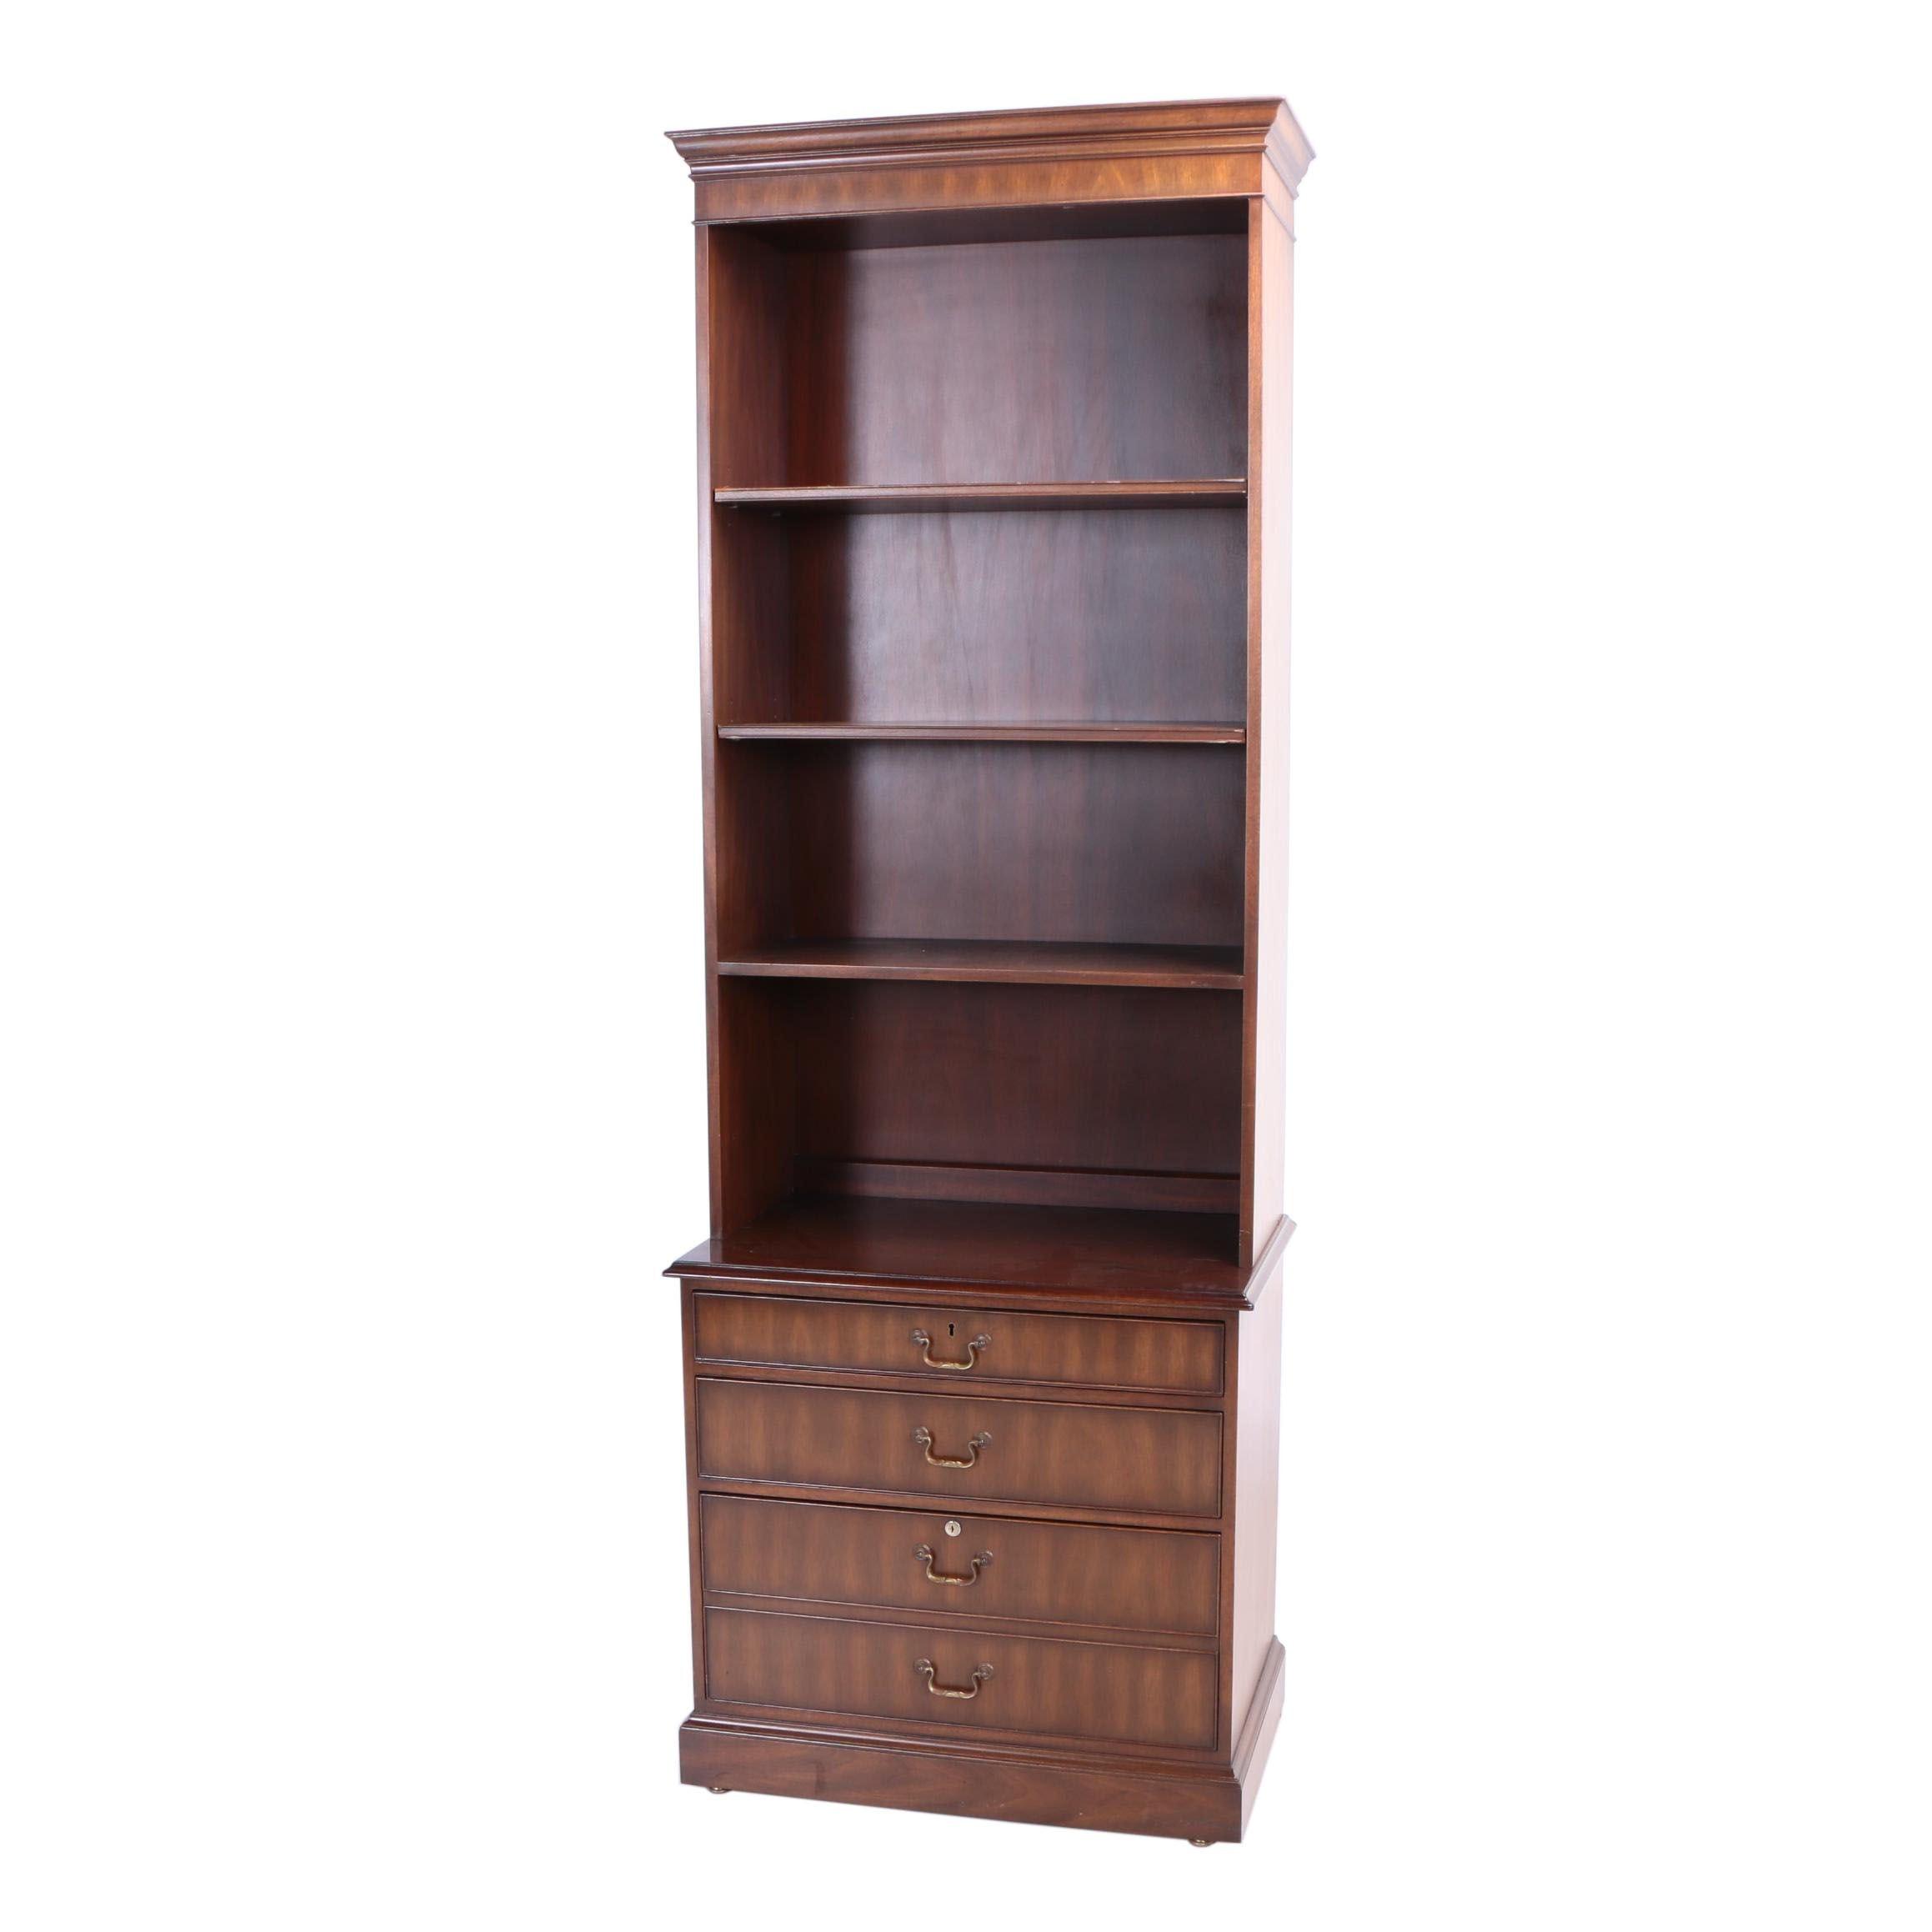 Kittinger Furniture, Mahogany Bookcase-on-Chest, 20th Century